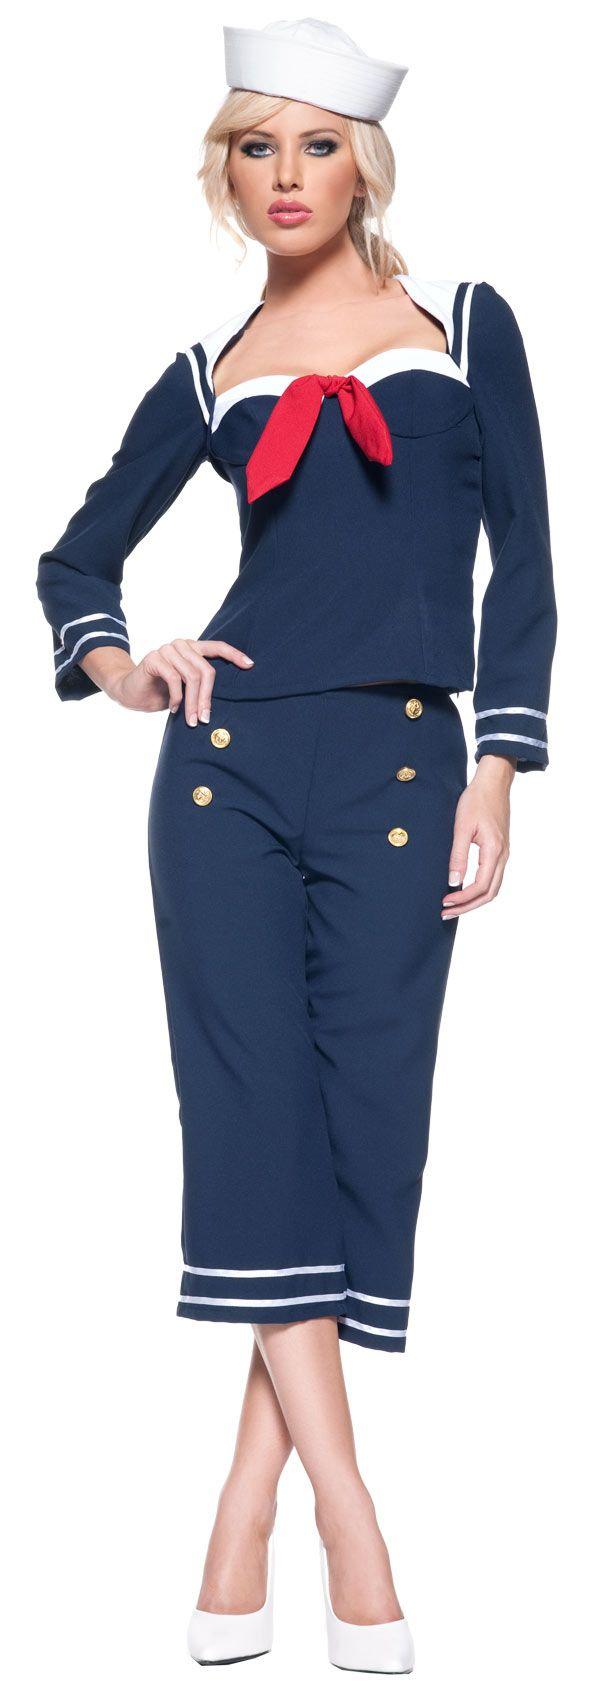 sailor+costume | Ship Mate Sailor Costume - Sailor Costumes